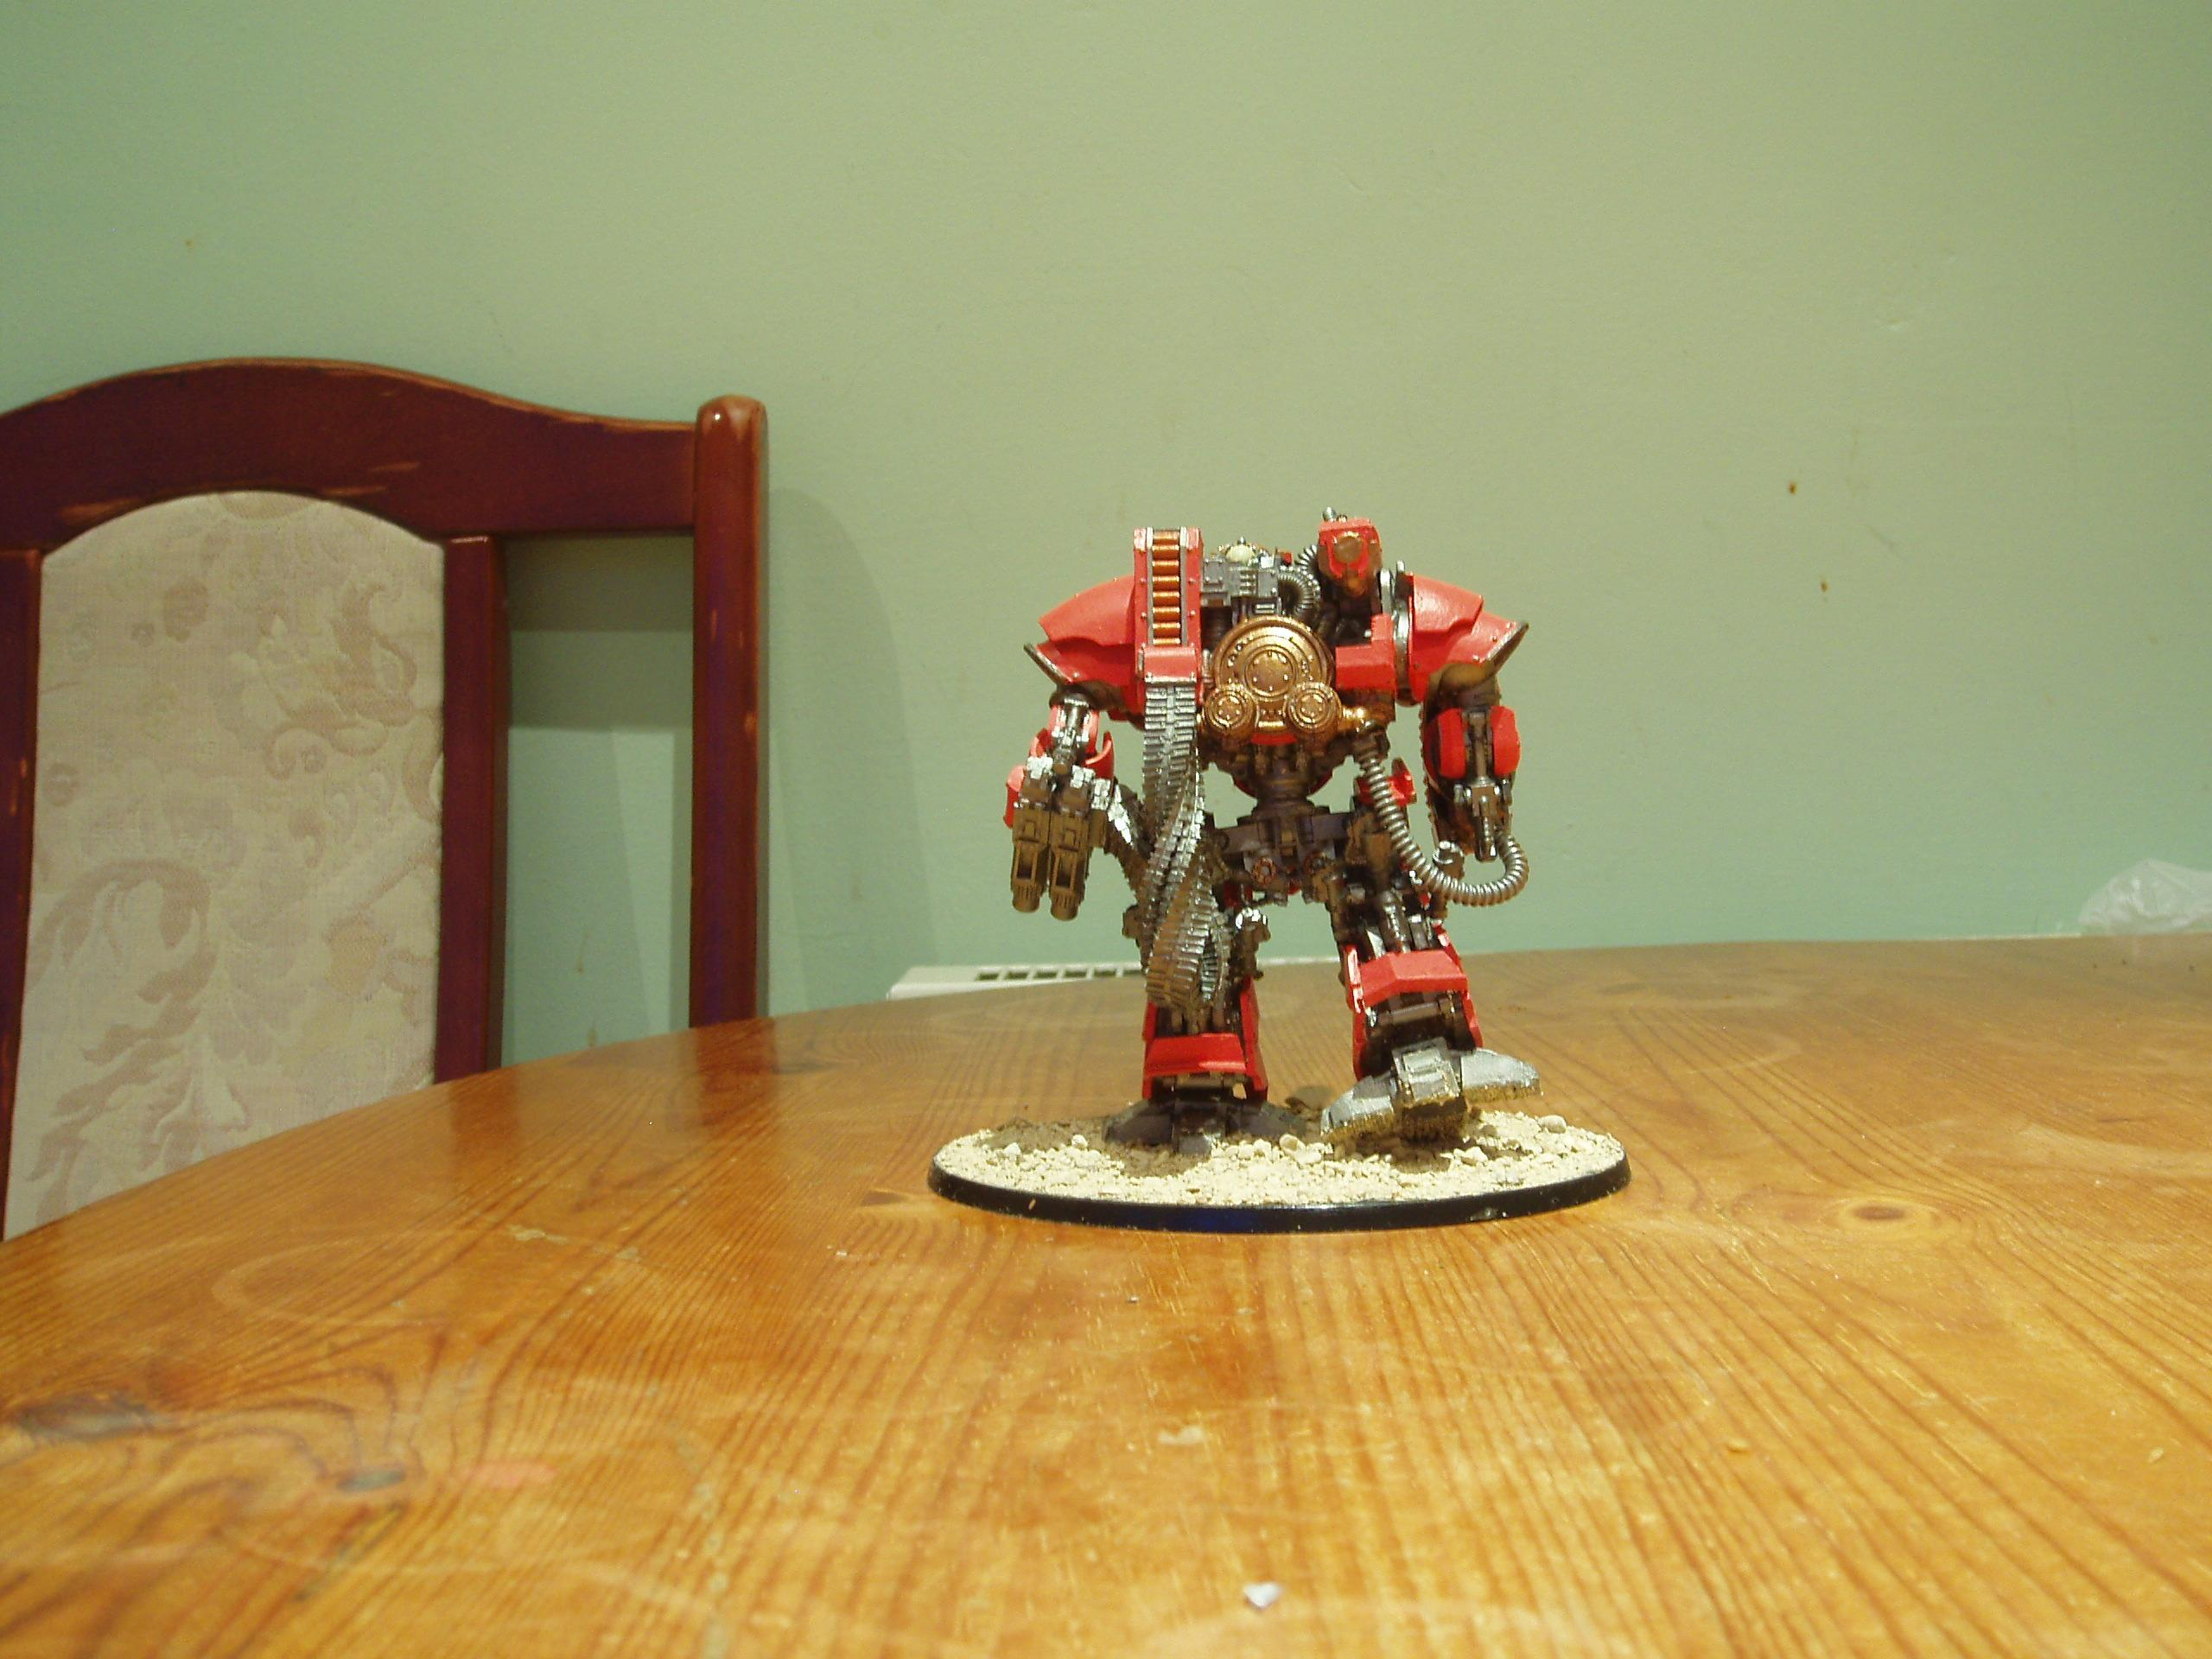 Calix, Mechanicum, Ordo Reductor, Siege Automata, Sollex Pattern Lascannon, Thanatar, Thanatar-calix